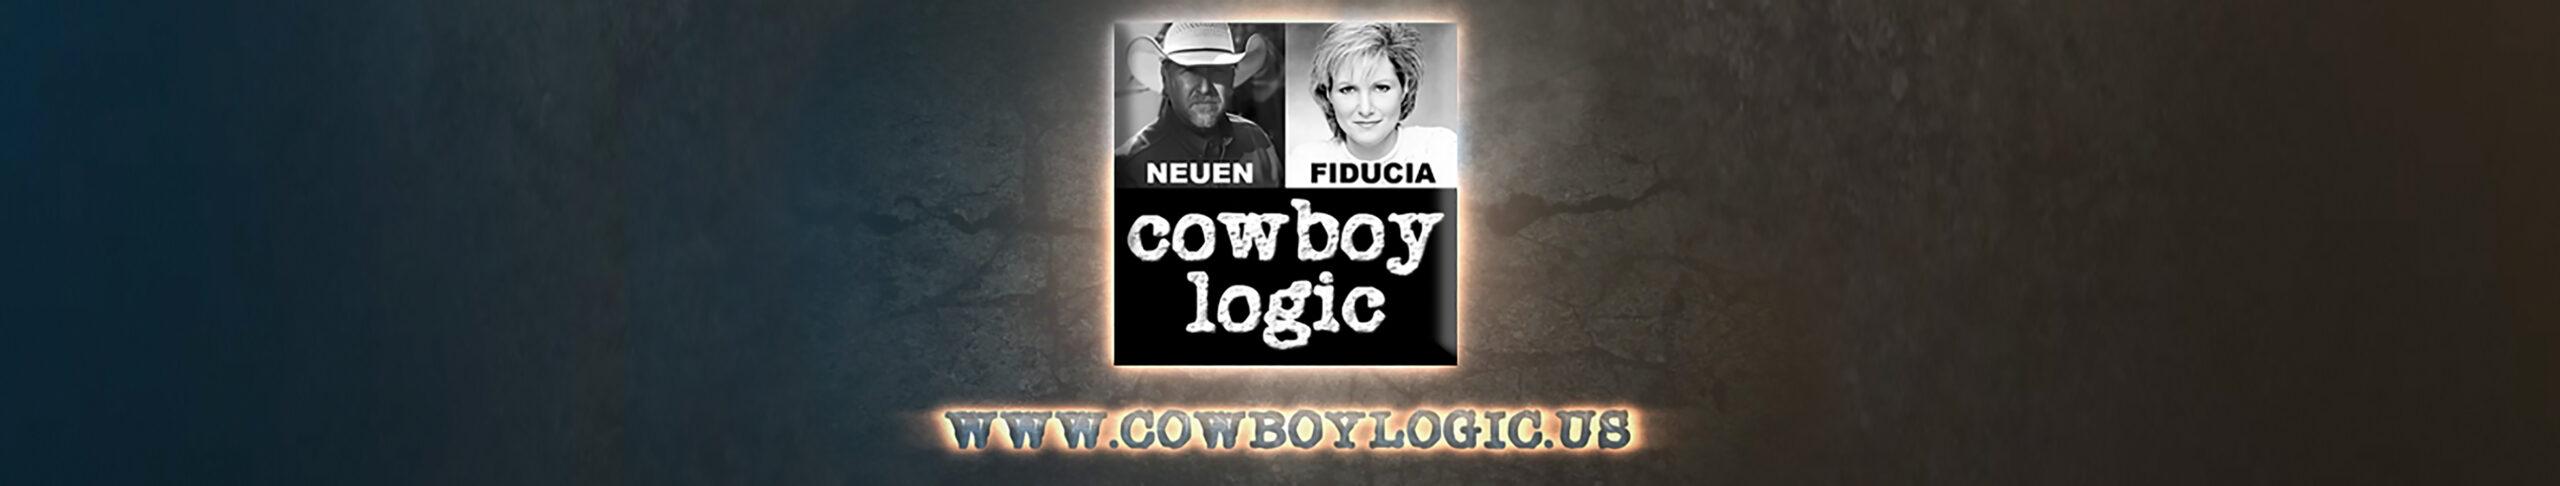 Cowboy Logic Radio / Donna Fiducia Productions Logo